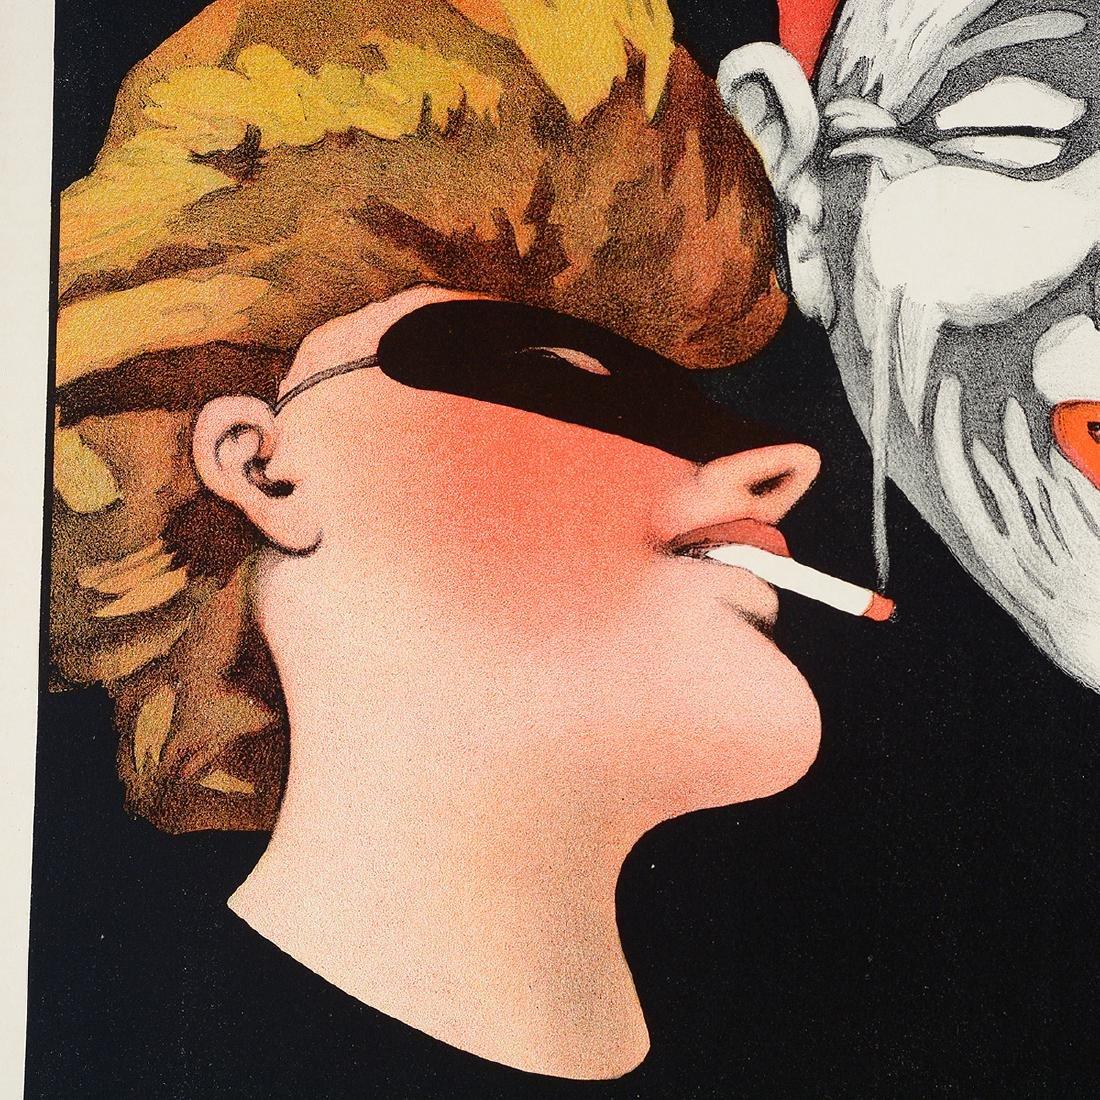 European lithograph posters Circus Stock & Cig. Leo - 7